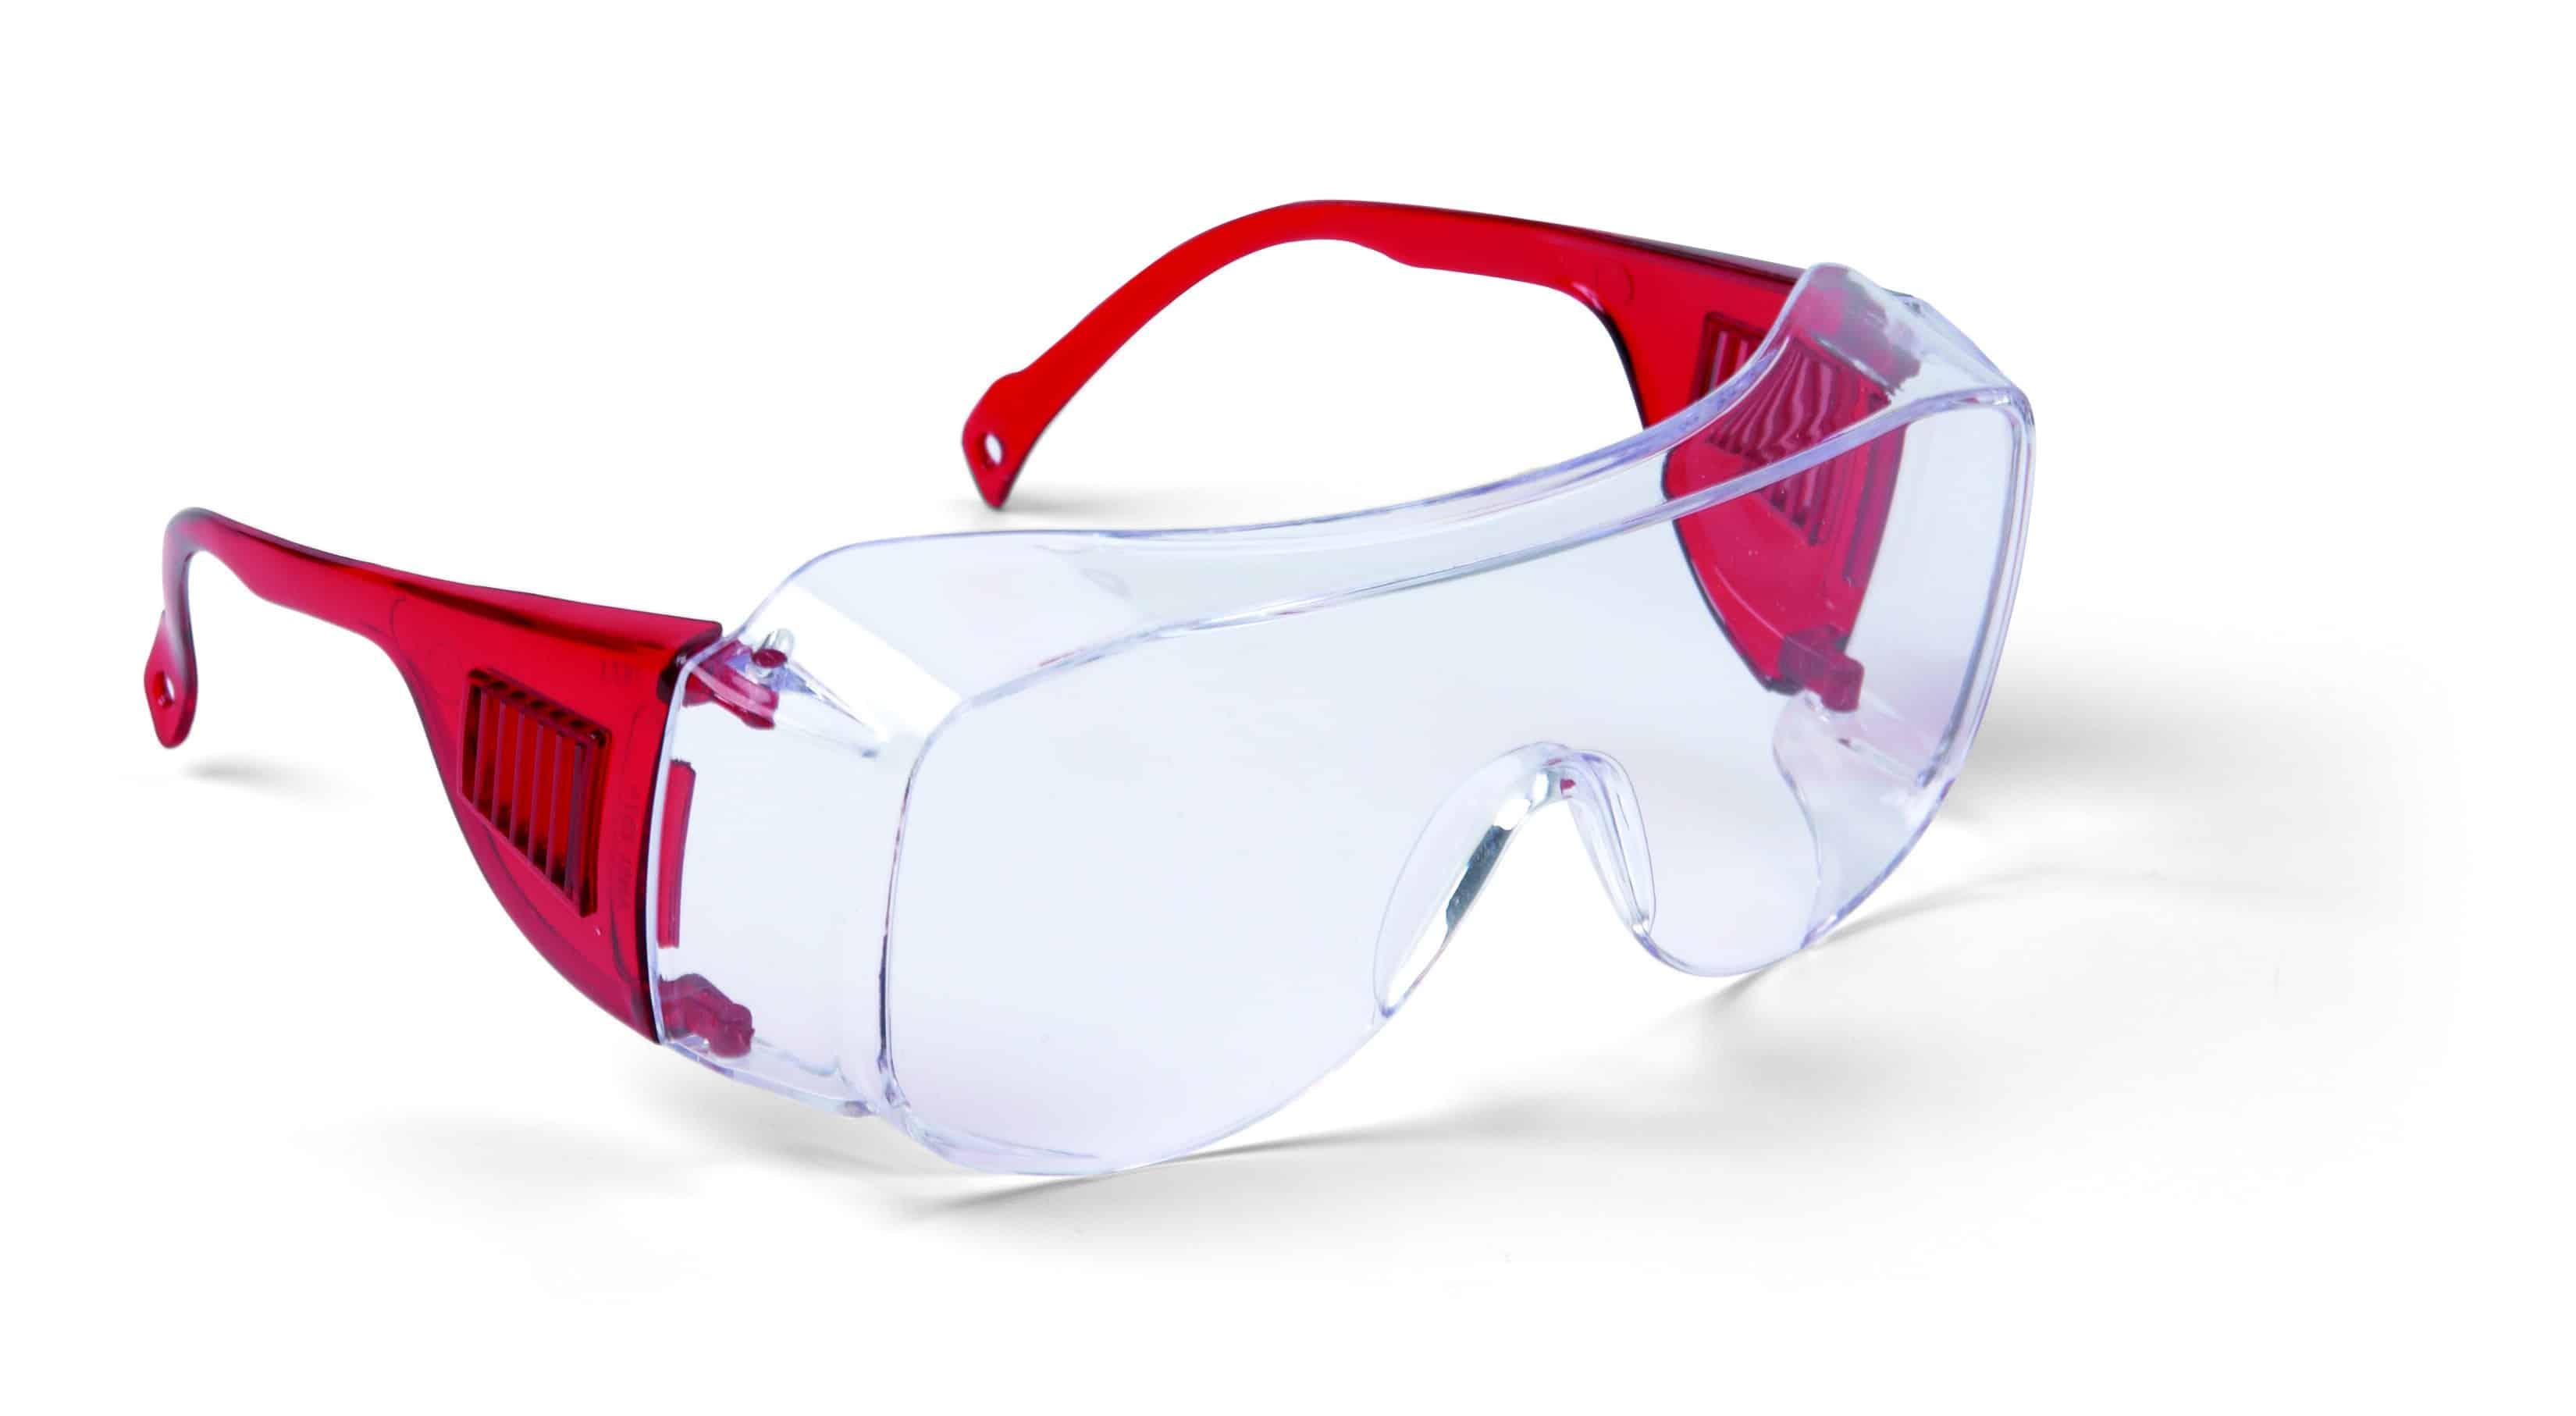 Schuller Eh'klar SAFEVIEW Schutzbrille